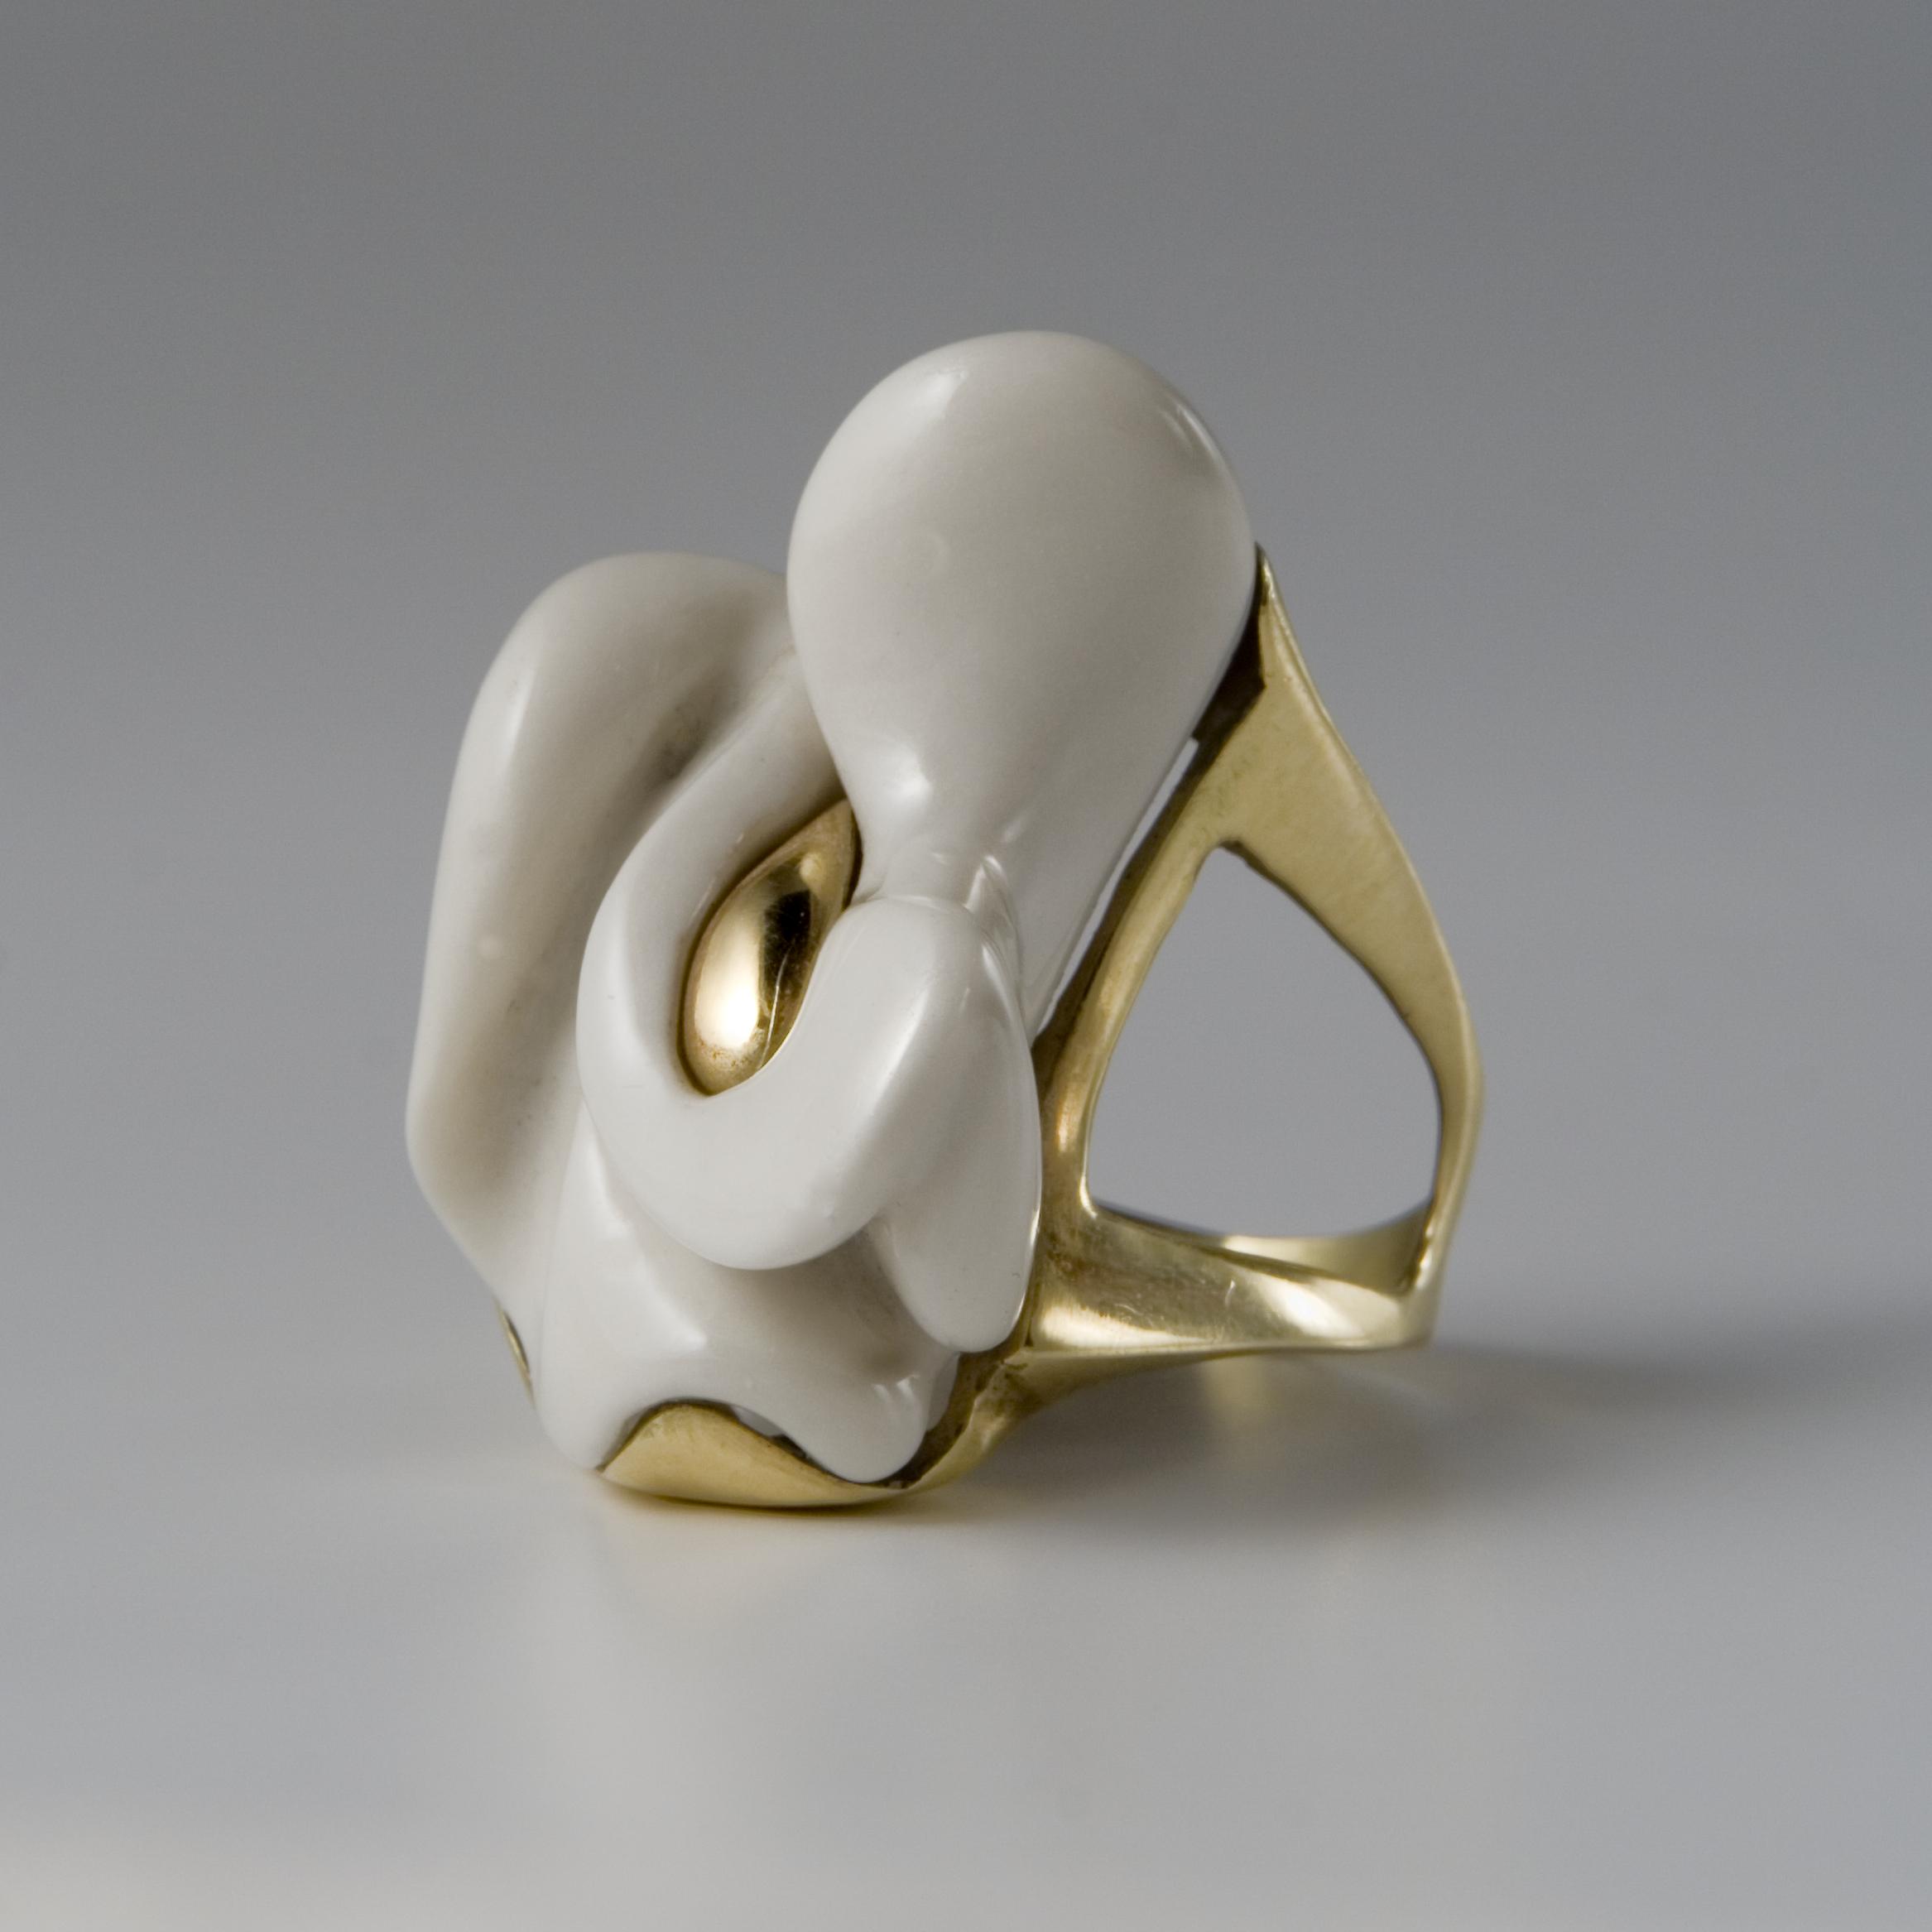 Italian sculptor and ceramicist Antonia Campi at design and art gallery Casati Gallery